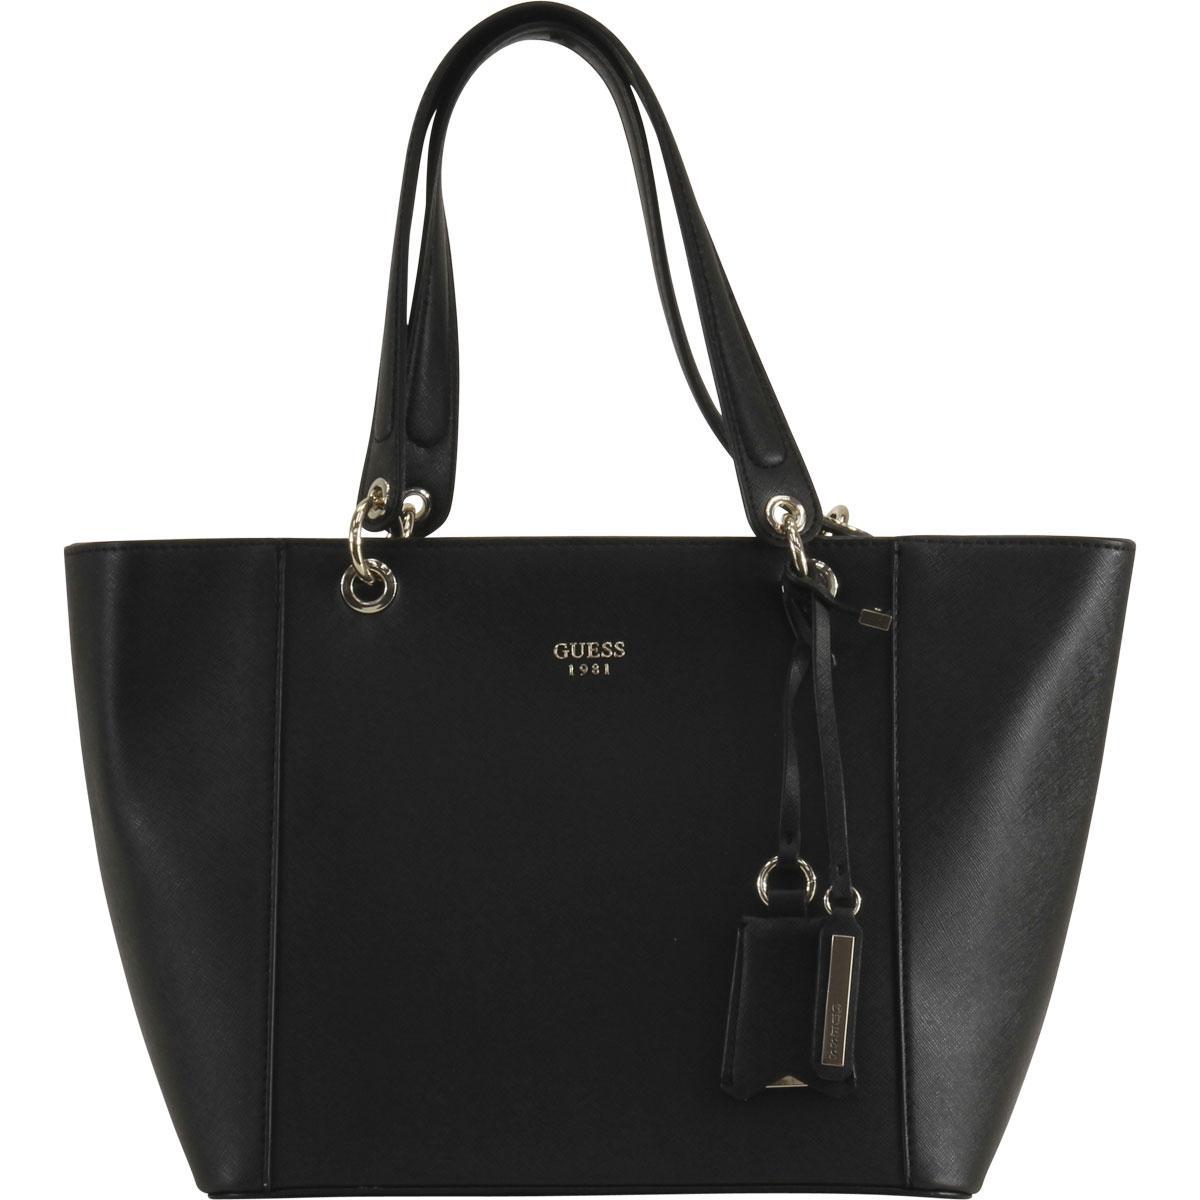 Guess Women's Kamryn Saffiano Tote Handbag